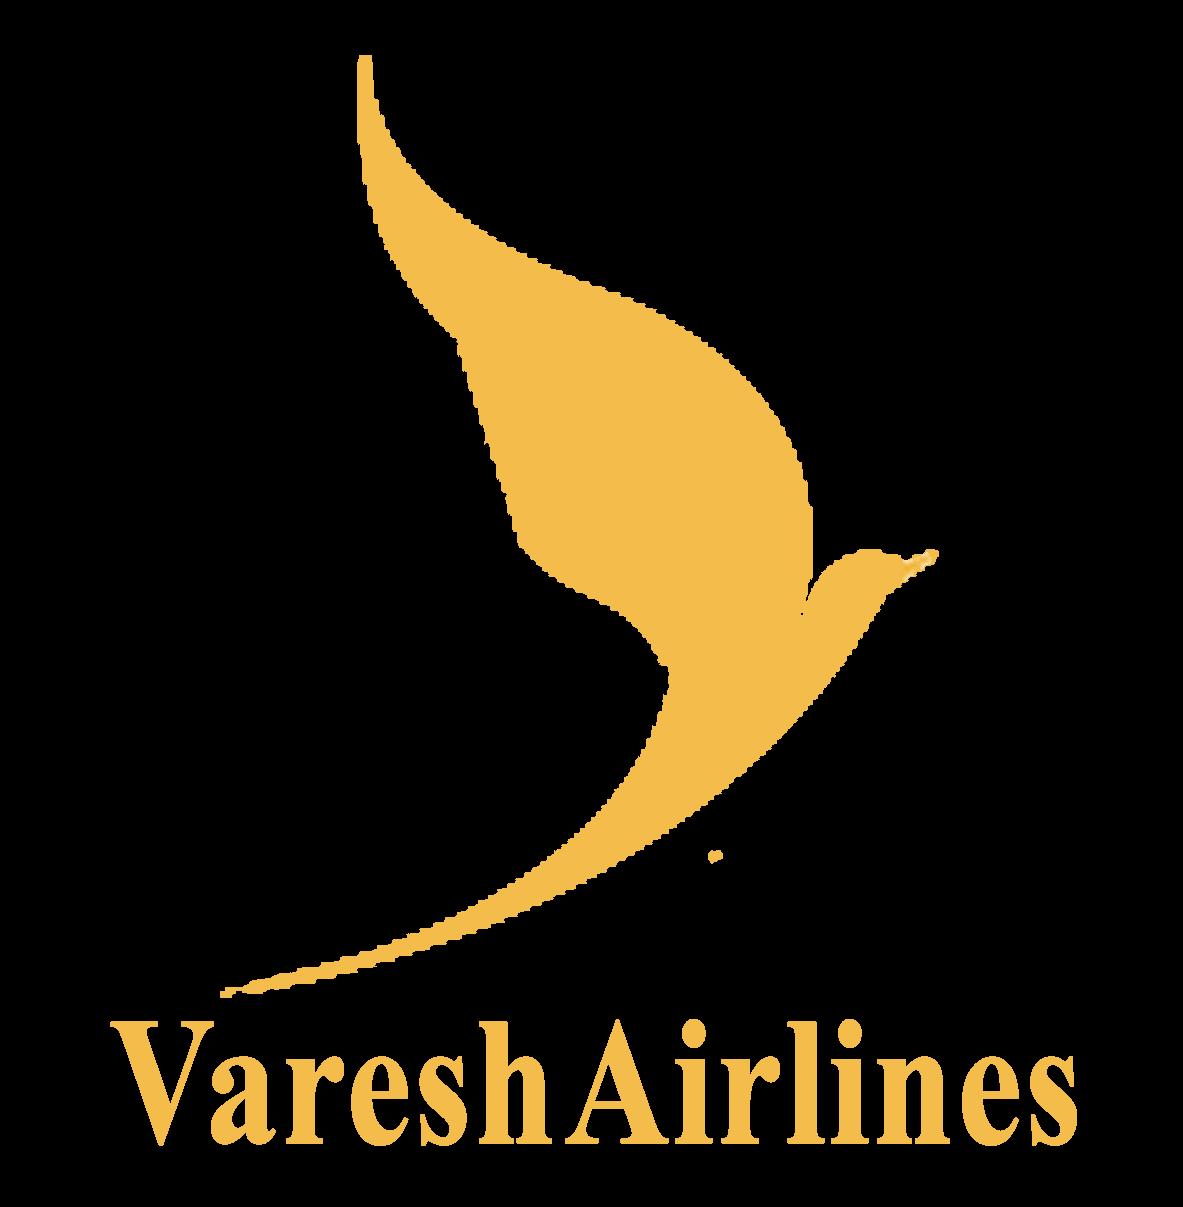 Varesh Airlines